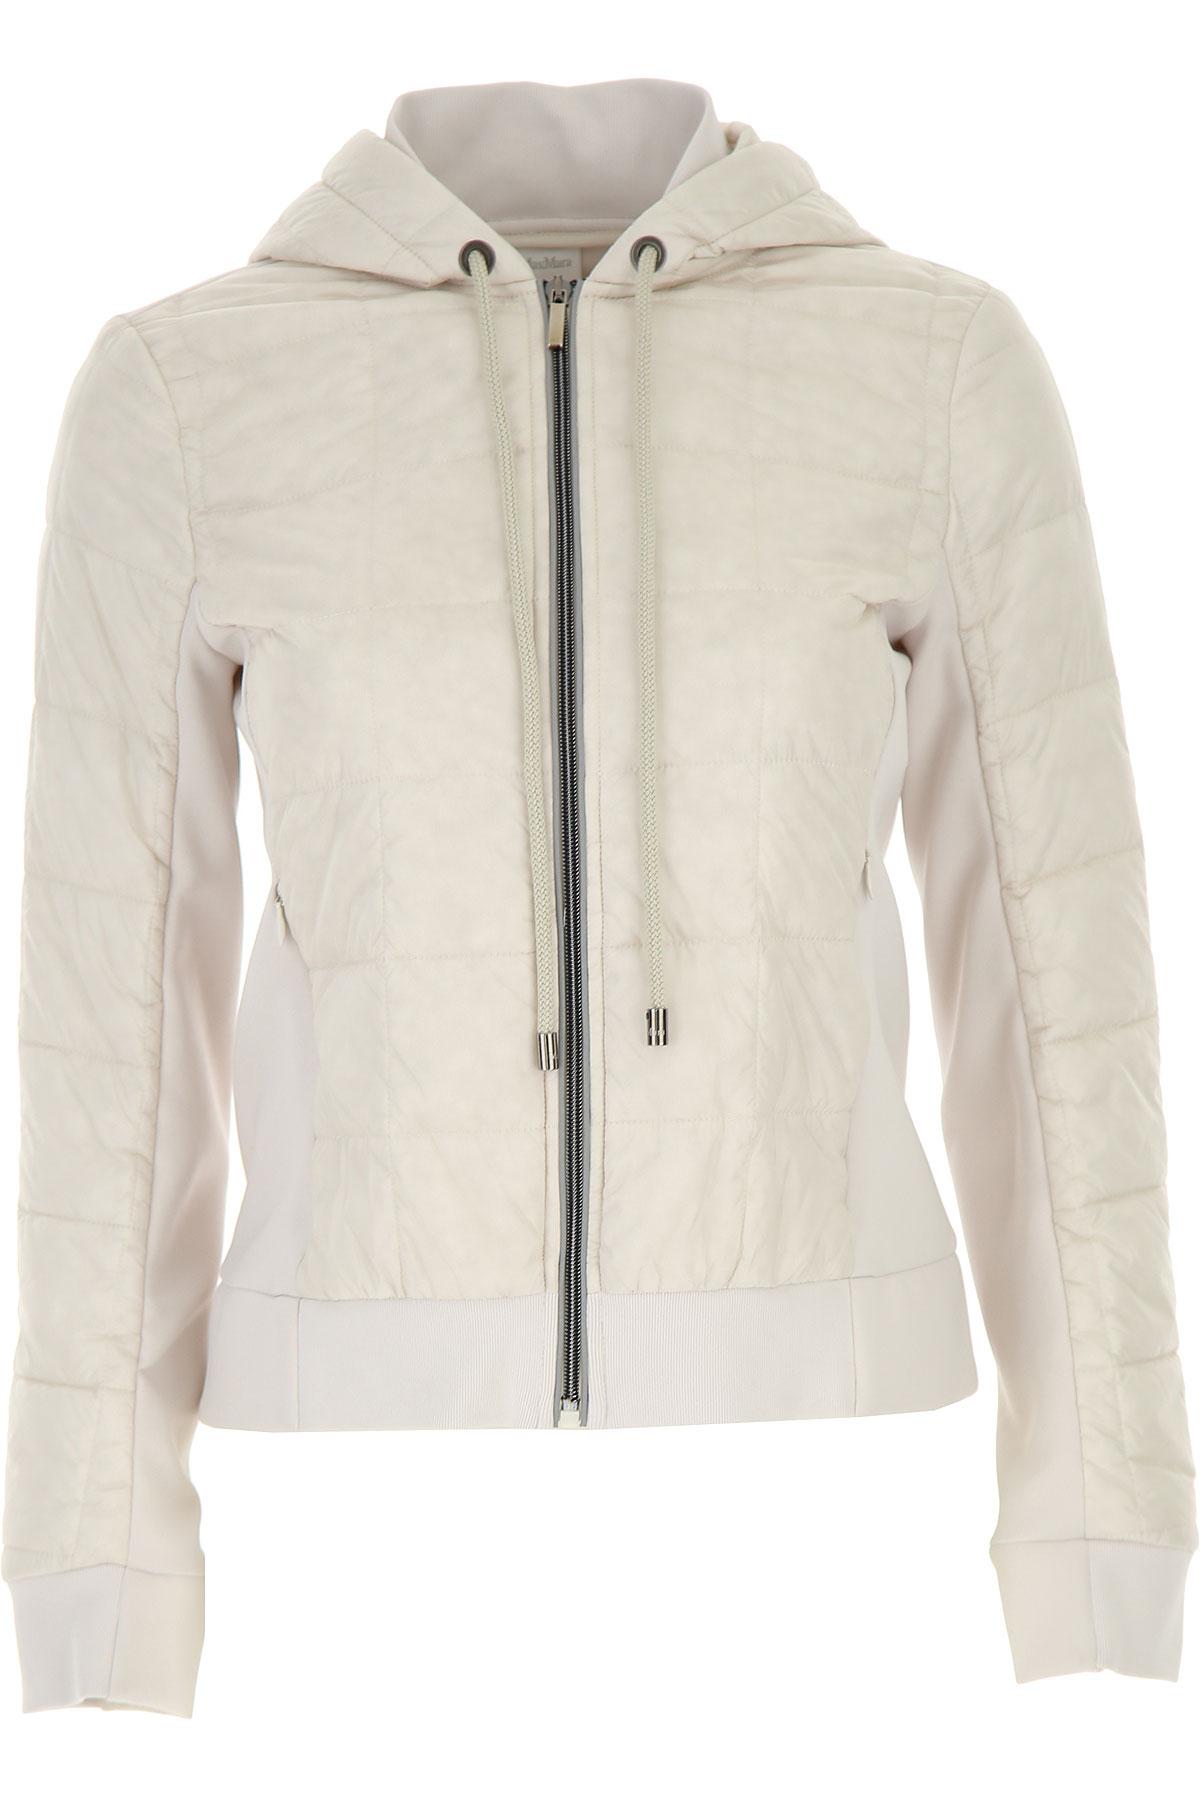 Max Mara Down Jacket for Women, Puffer Ski Jacket On Sale, White, polyamide, 2019, 10 4 6 8